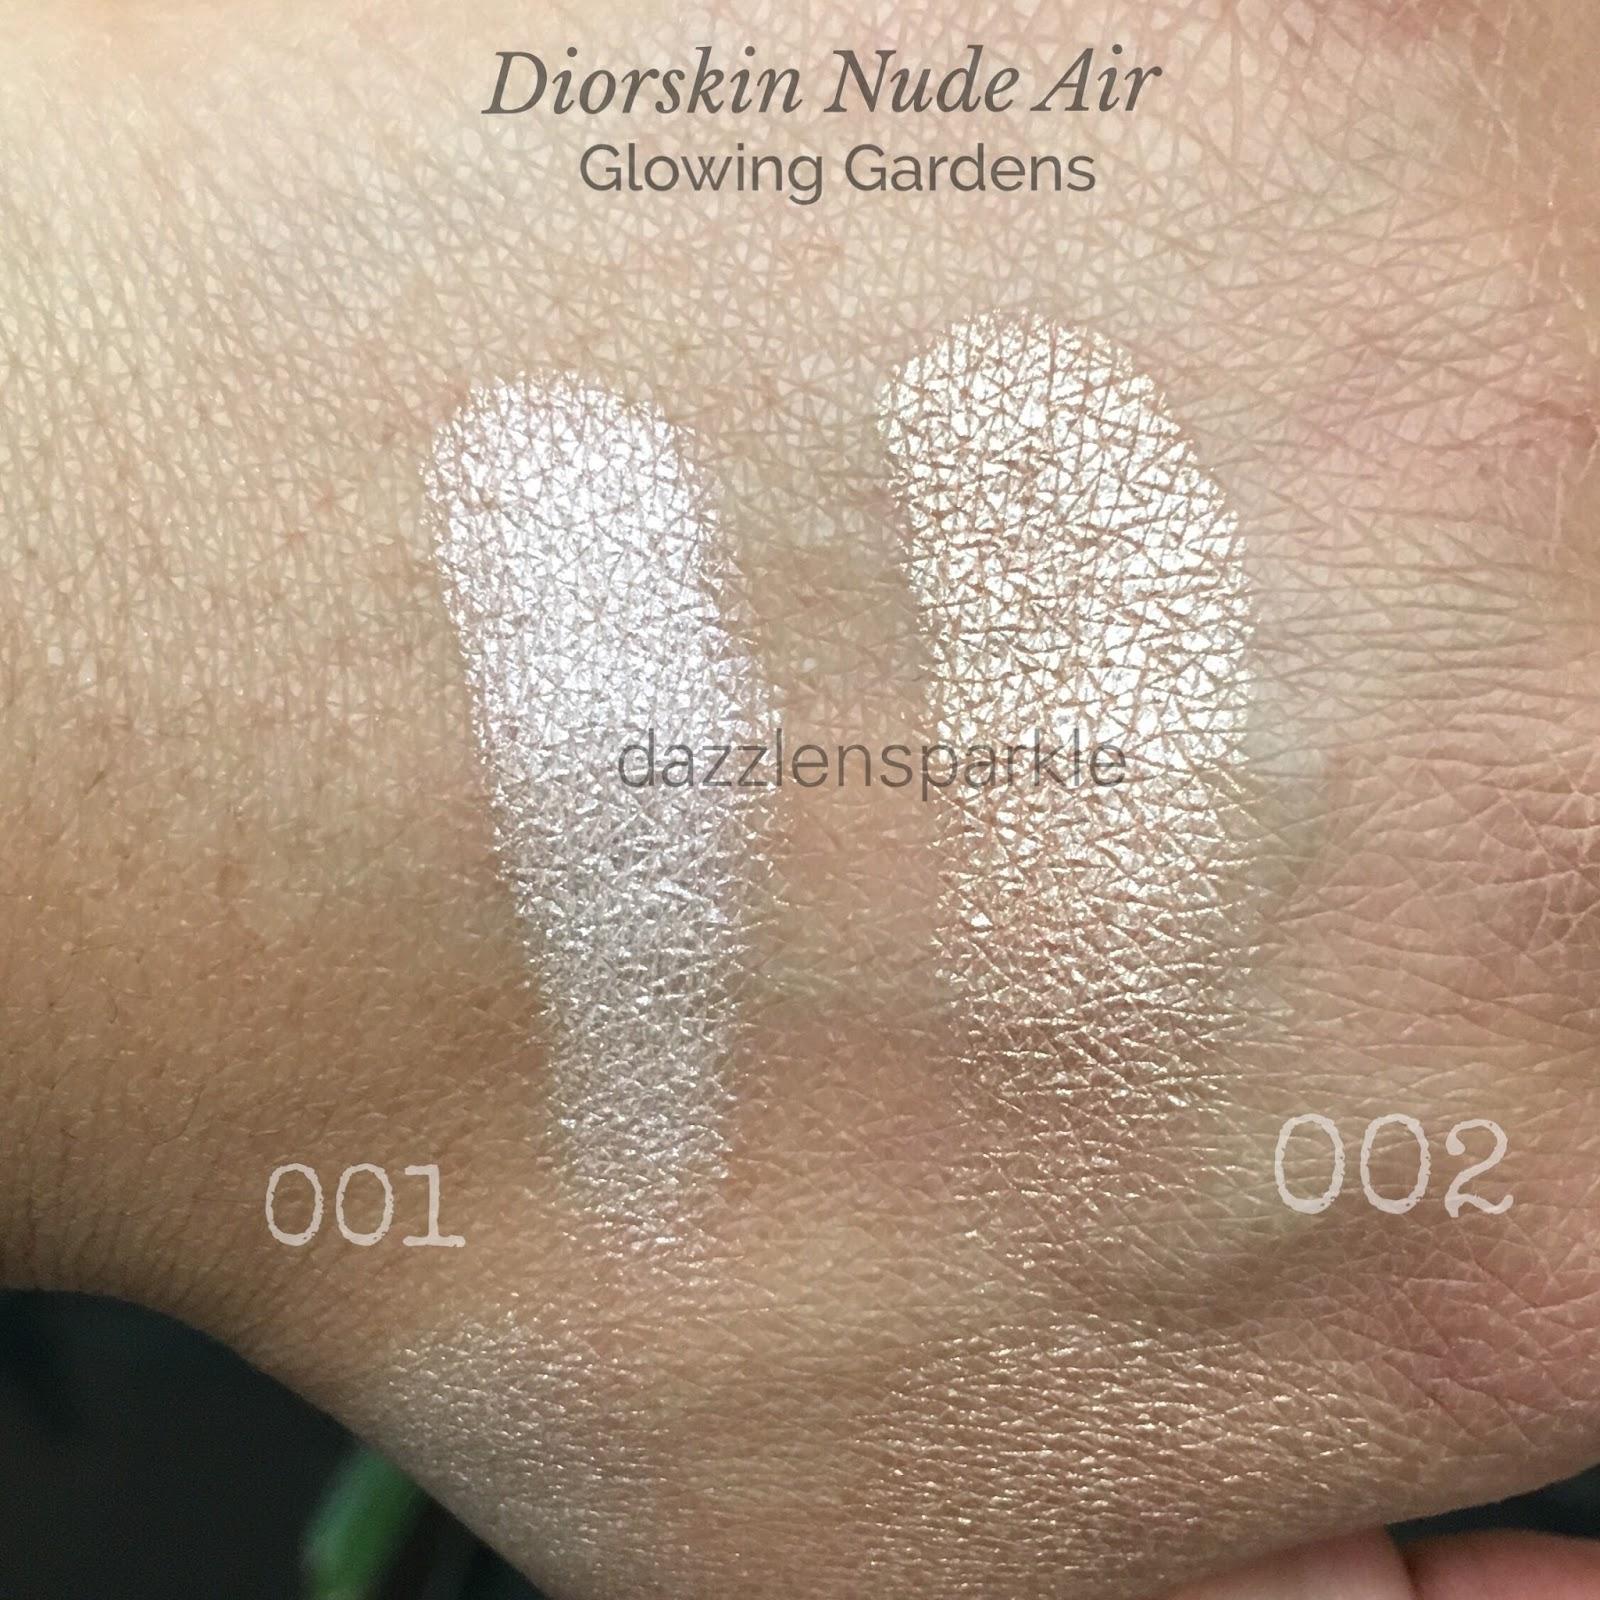 Diorskin Nude Luminizer by Dior #22